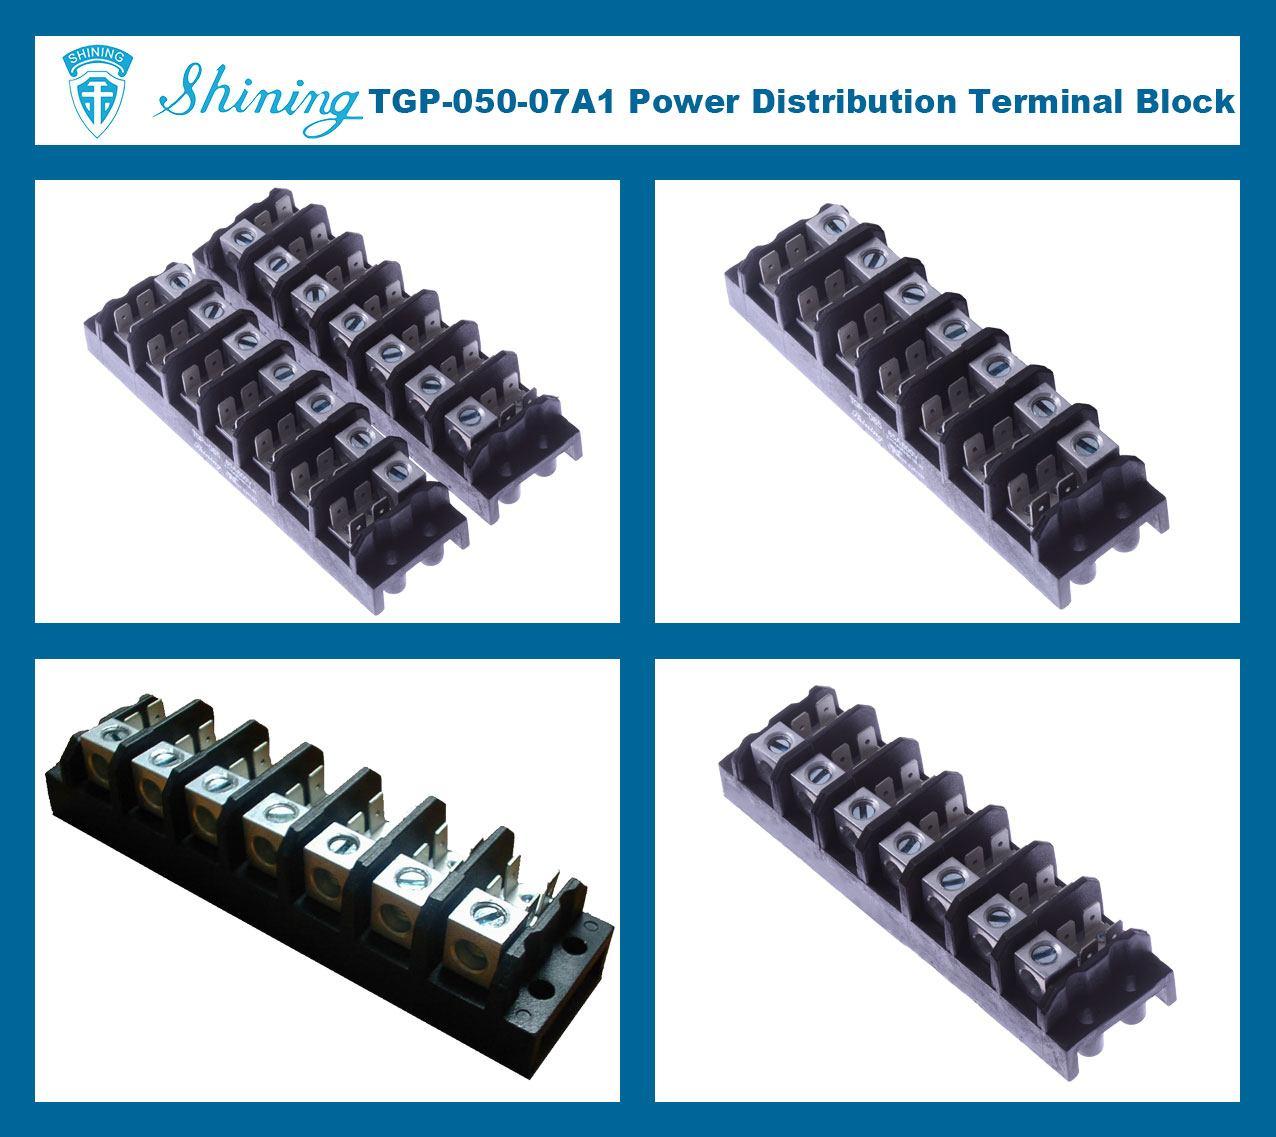 TGP-050-07A1 600V 50A 7 Pole Electrical Power Terminal Block